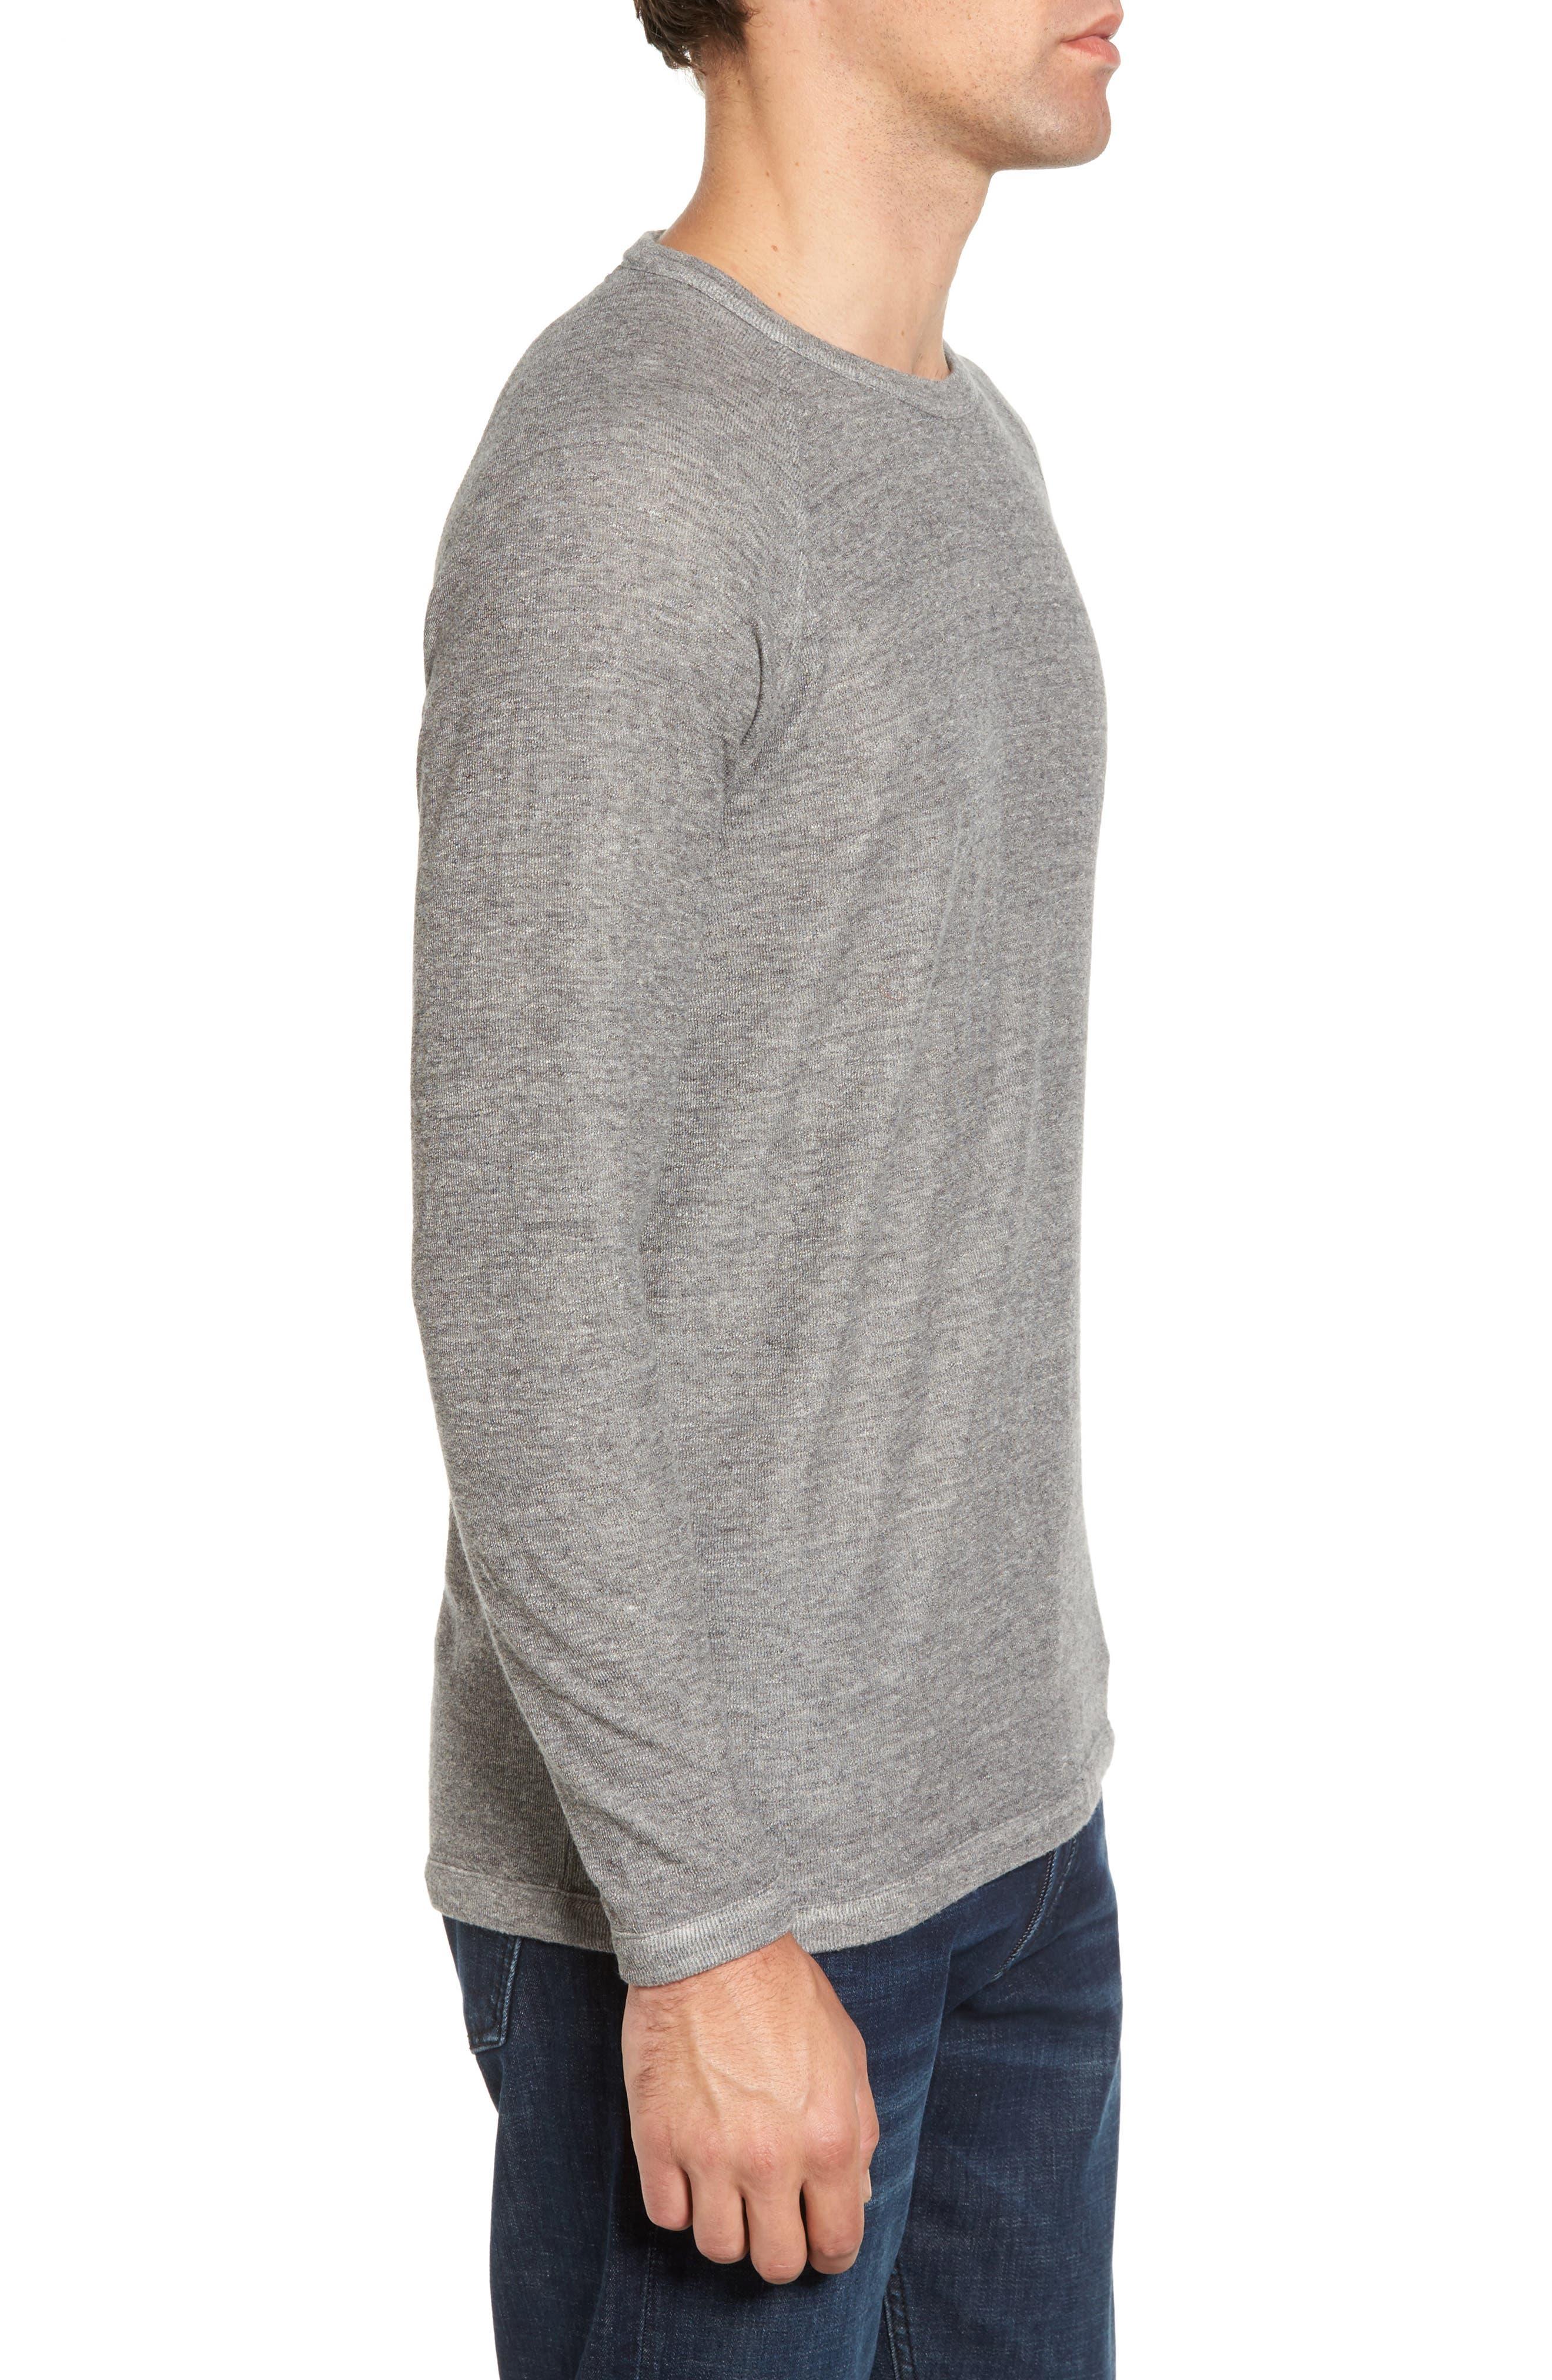 Jensen Double Cloth Crewneck Shirt,                             Alternate thumbnail 3, color,                             Grey